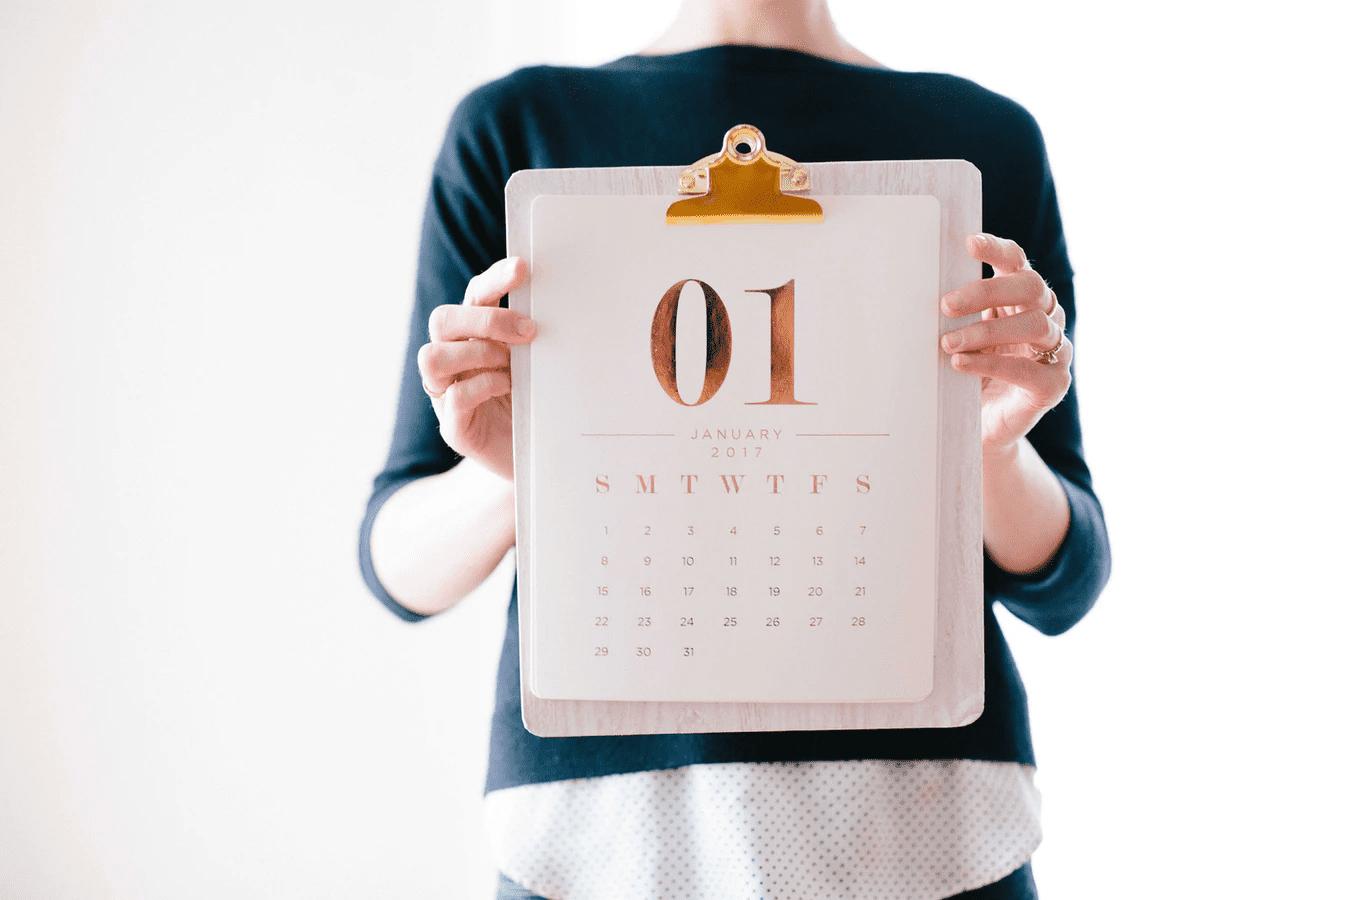 Calendar for setting up flextime schedule